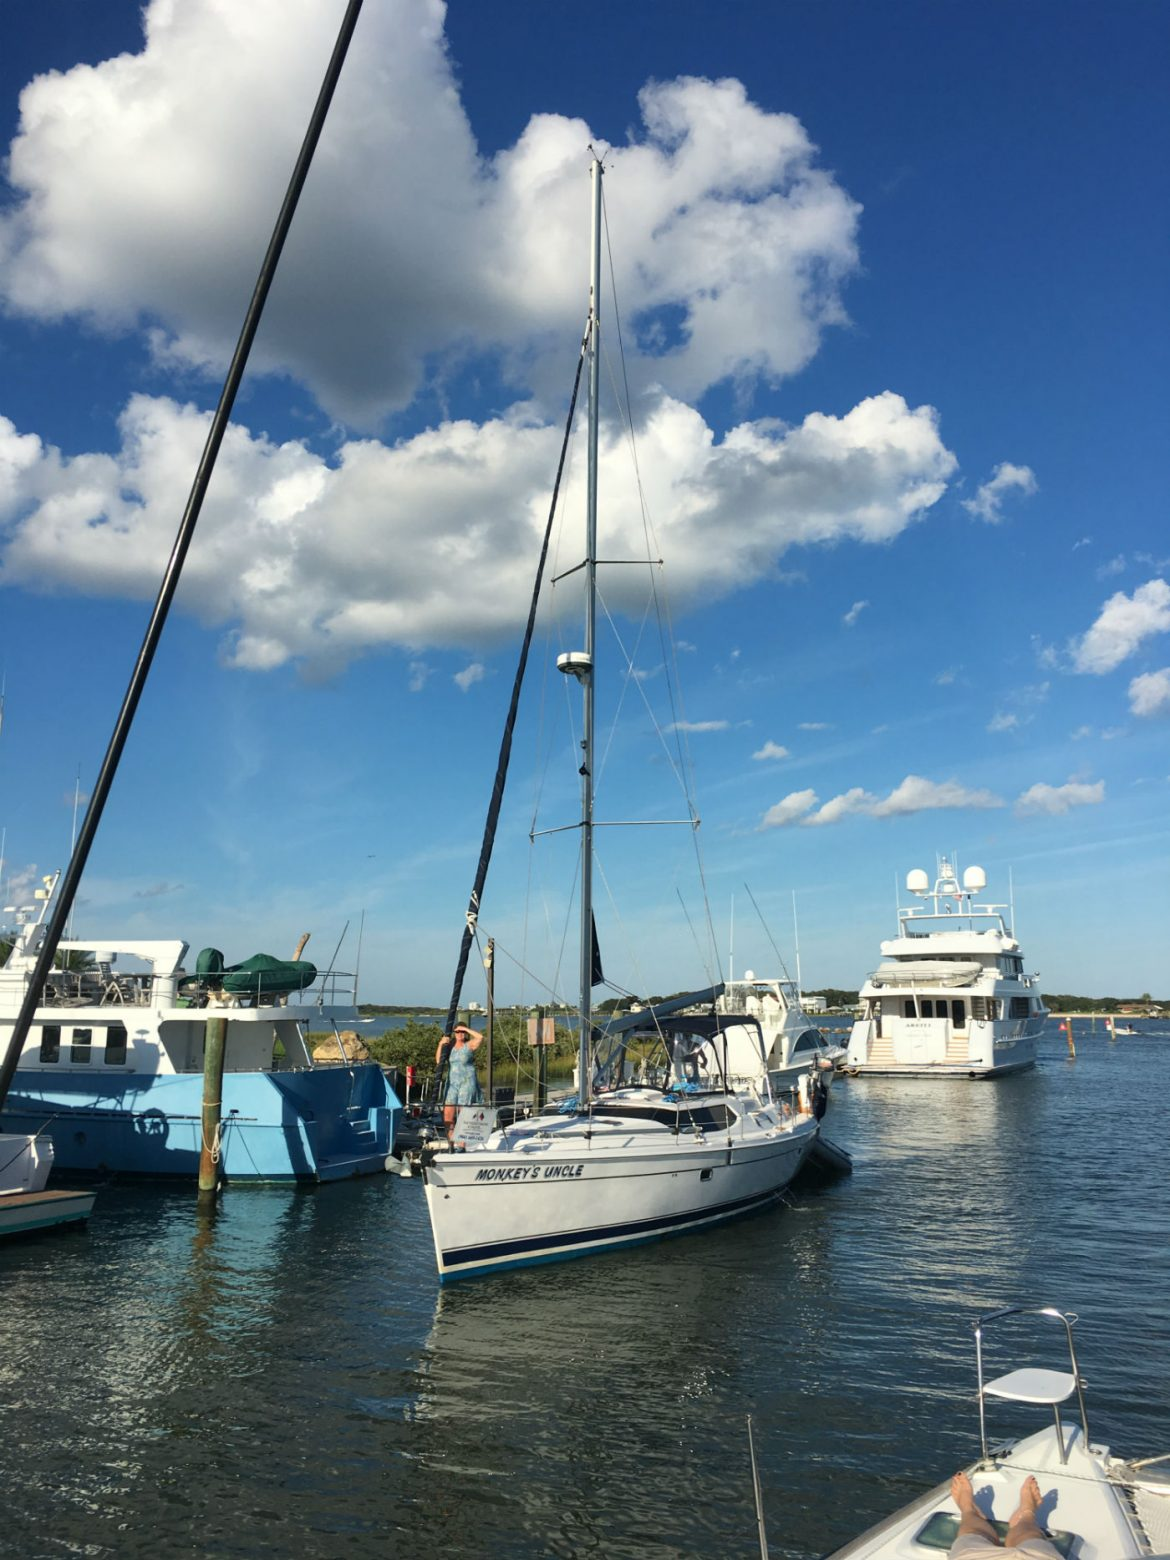 , Anatomy of a Sailboat – Part 3 – Below